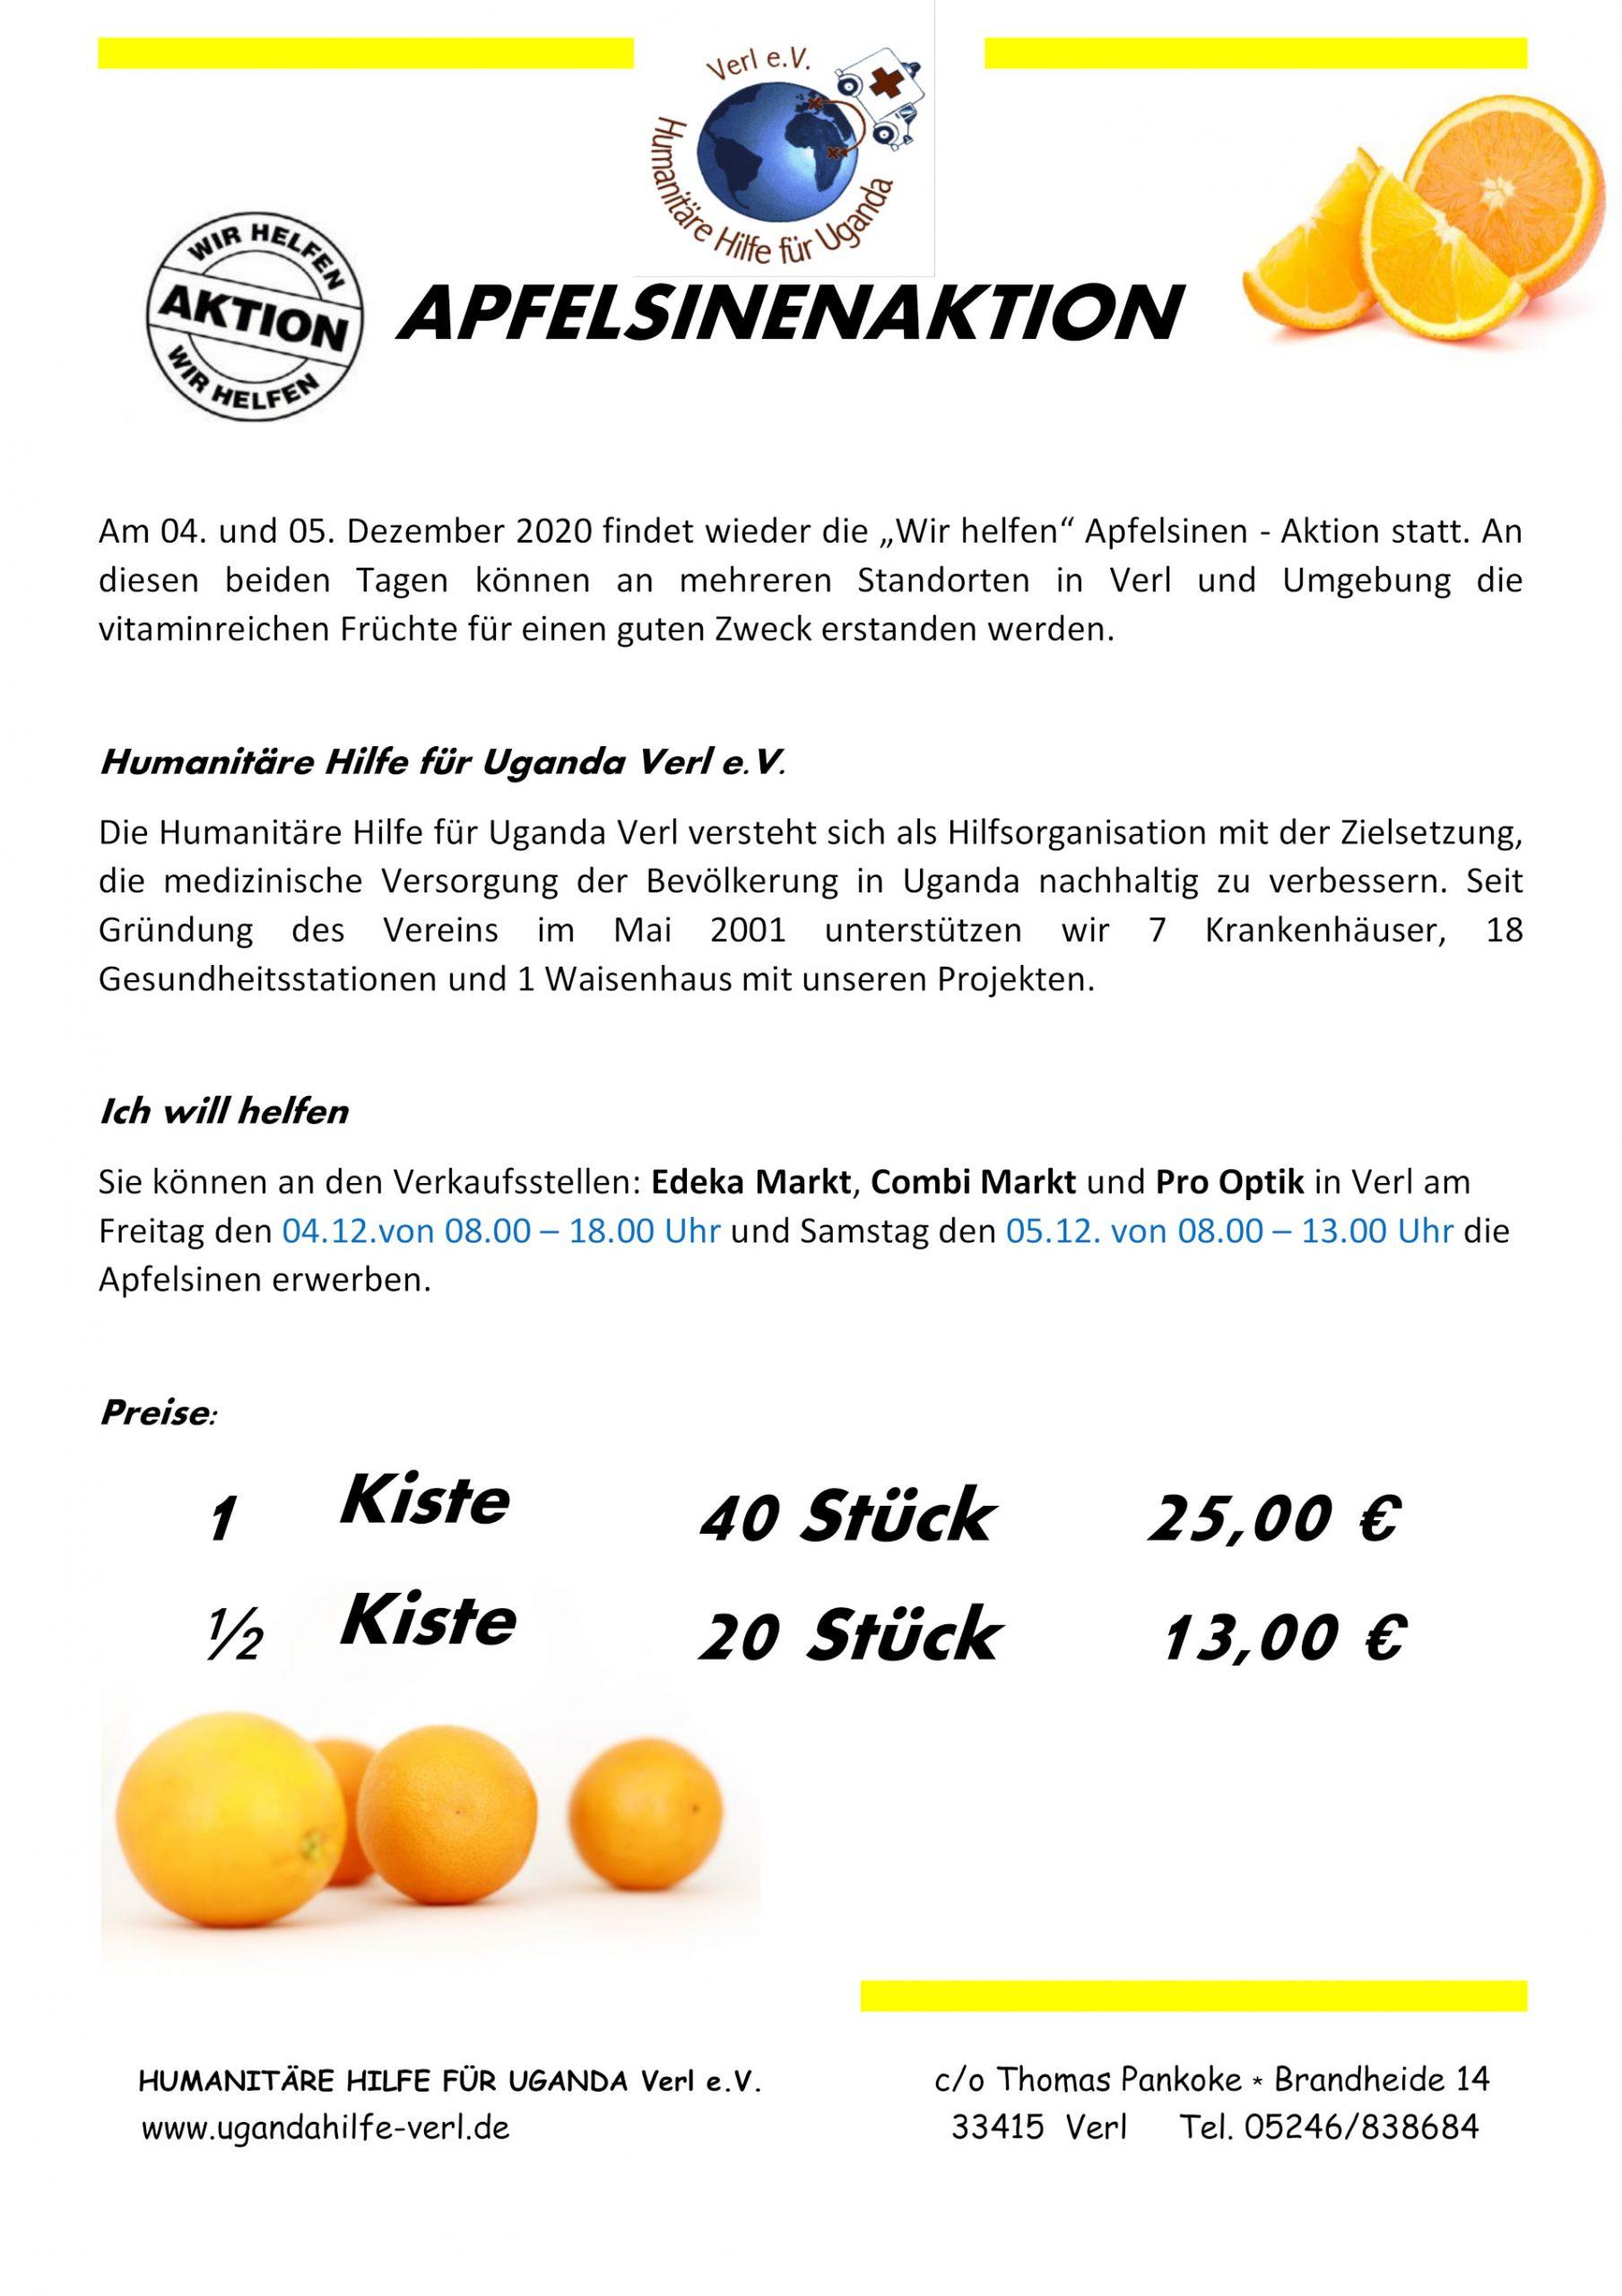 Flyer Apfelsinenaktion 2020